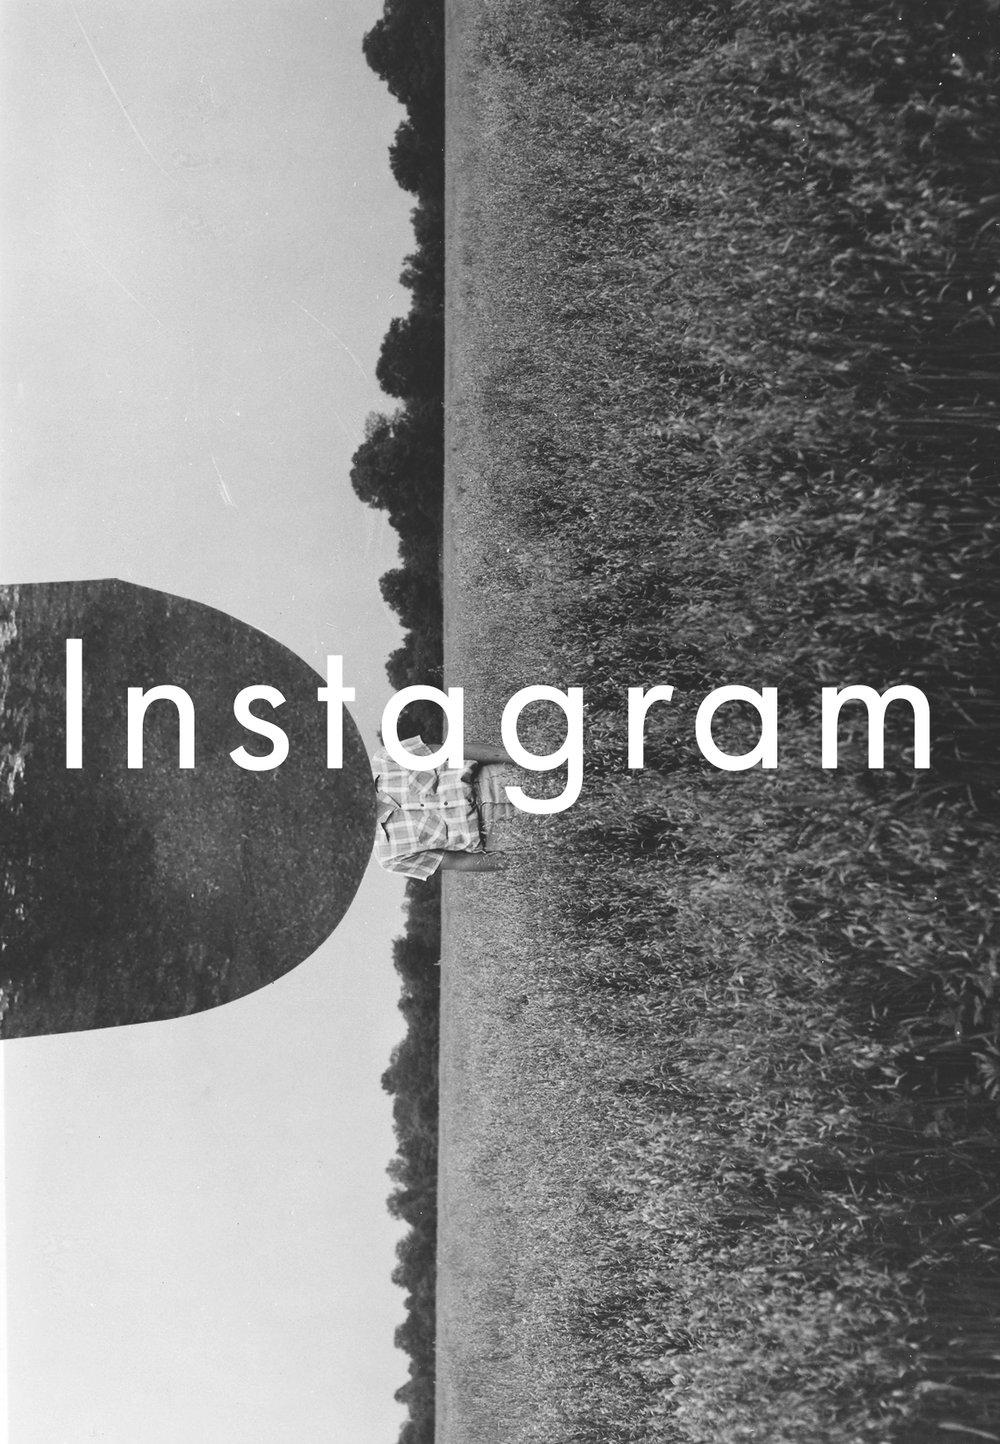 Houseofquinn-Instagram-page